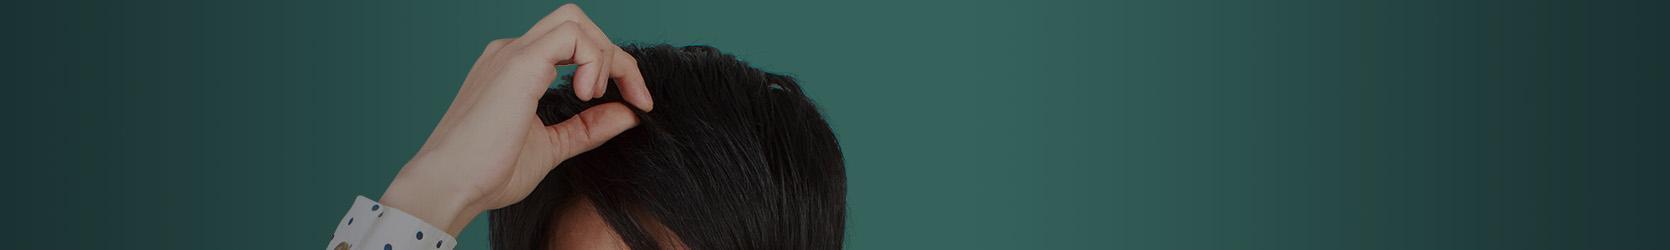 AGA(男性型脱毛症)治療